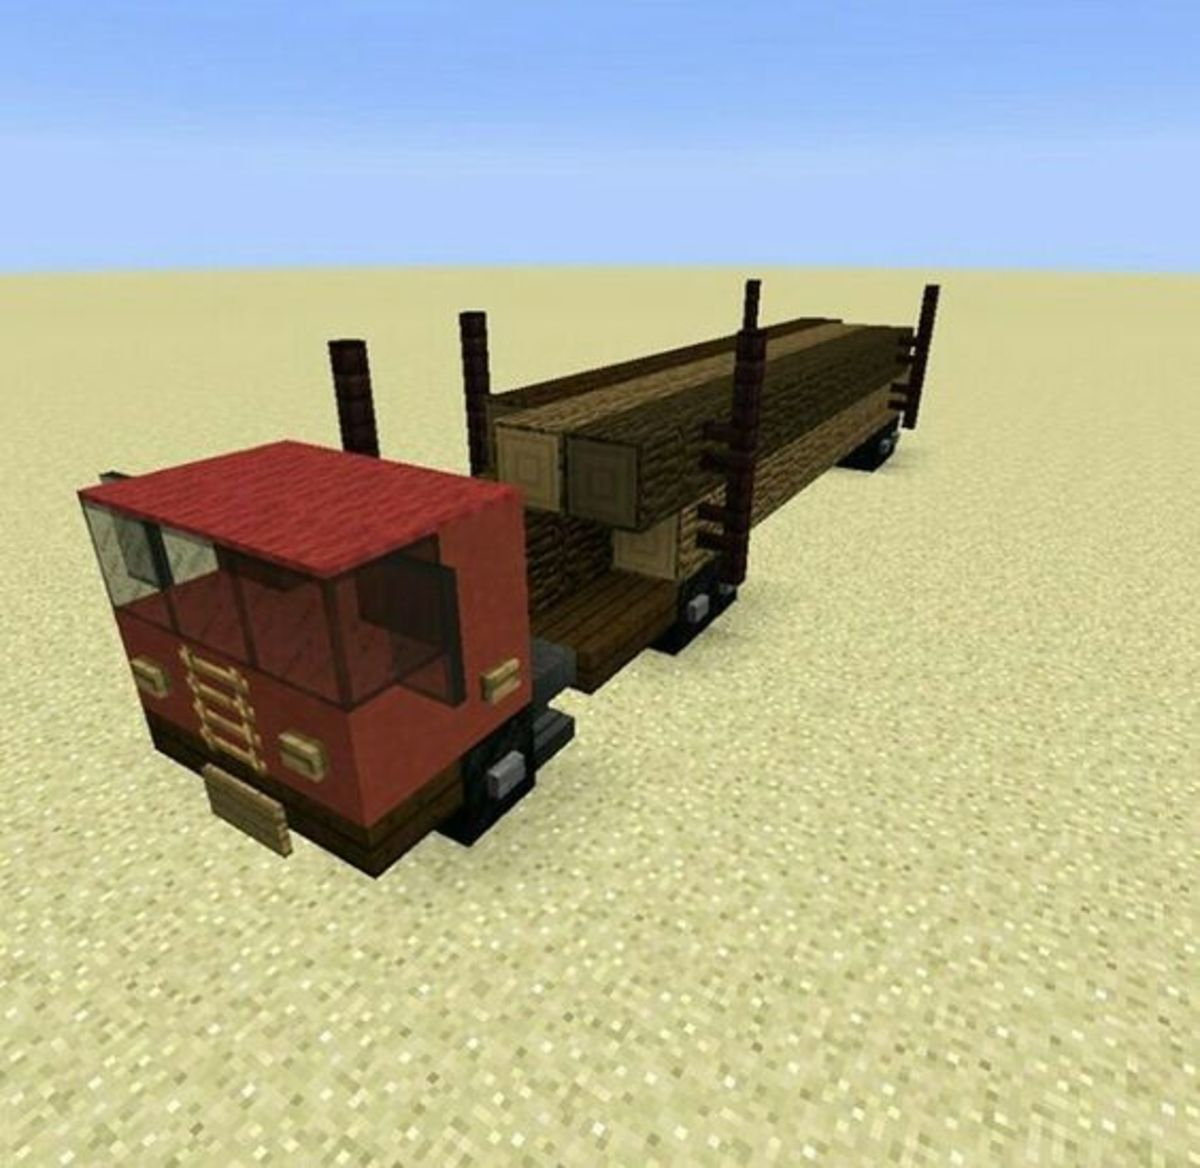 Detailed Truck